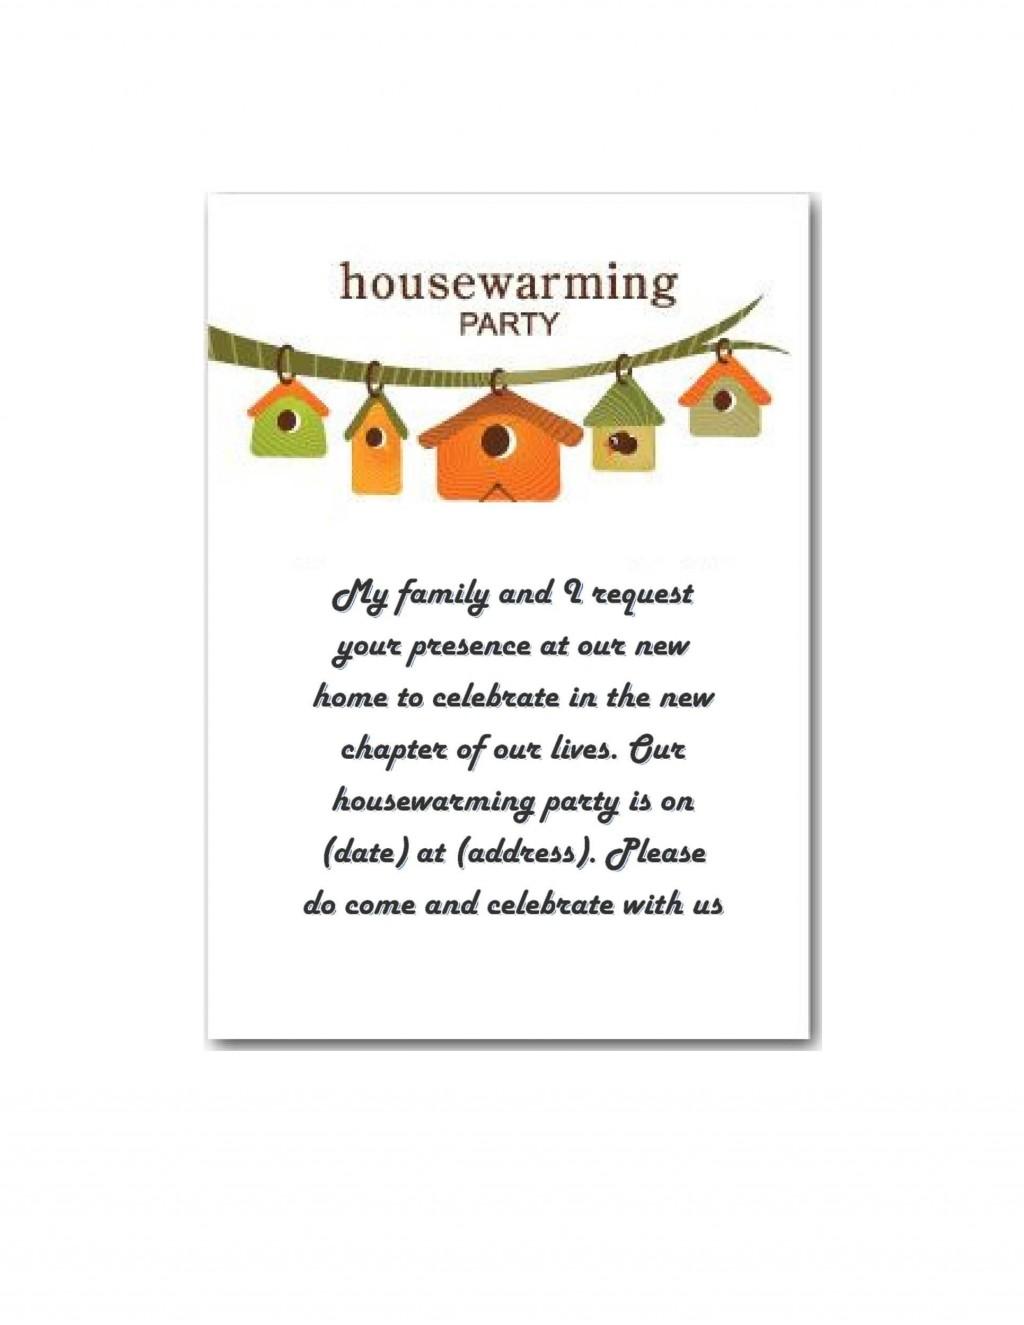 006 Striking Free Housewarming Invitation Template Photo  Templates Printable India Video DownloadLarge